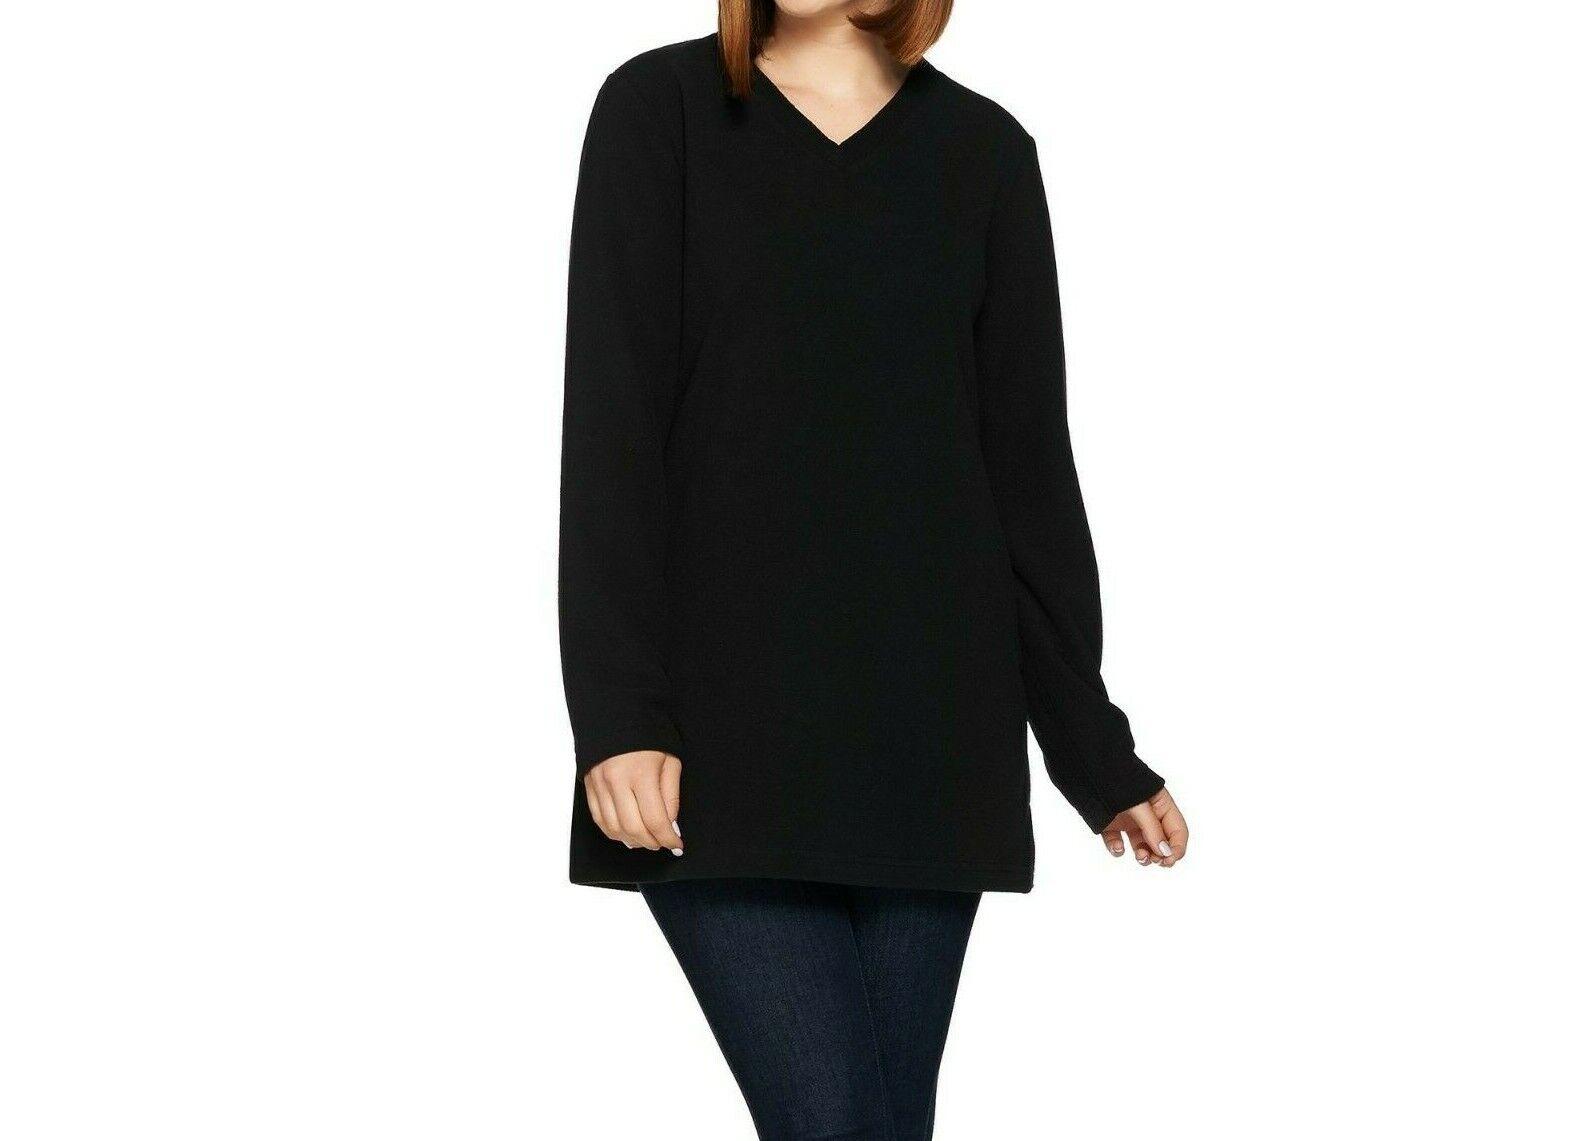 Denim Co Active V-Neck Tunic Hood Pockets Black L NEW A295727